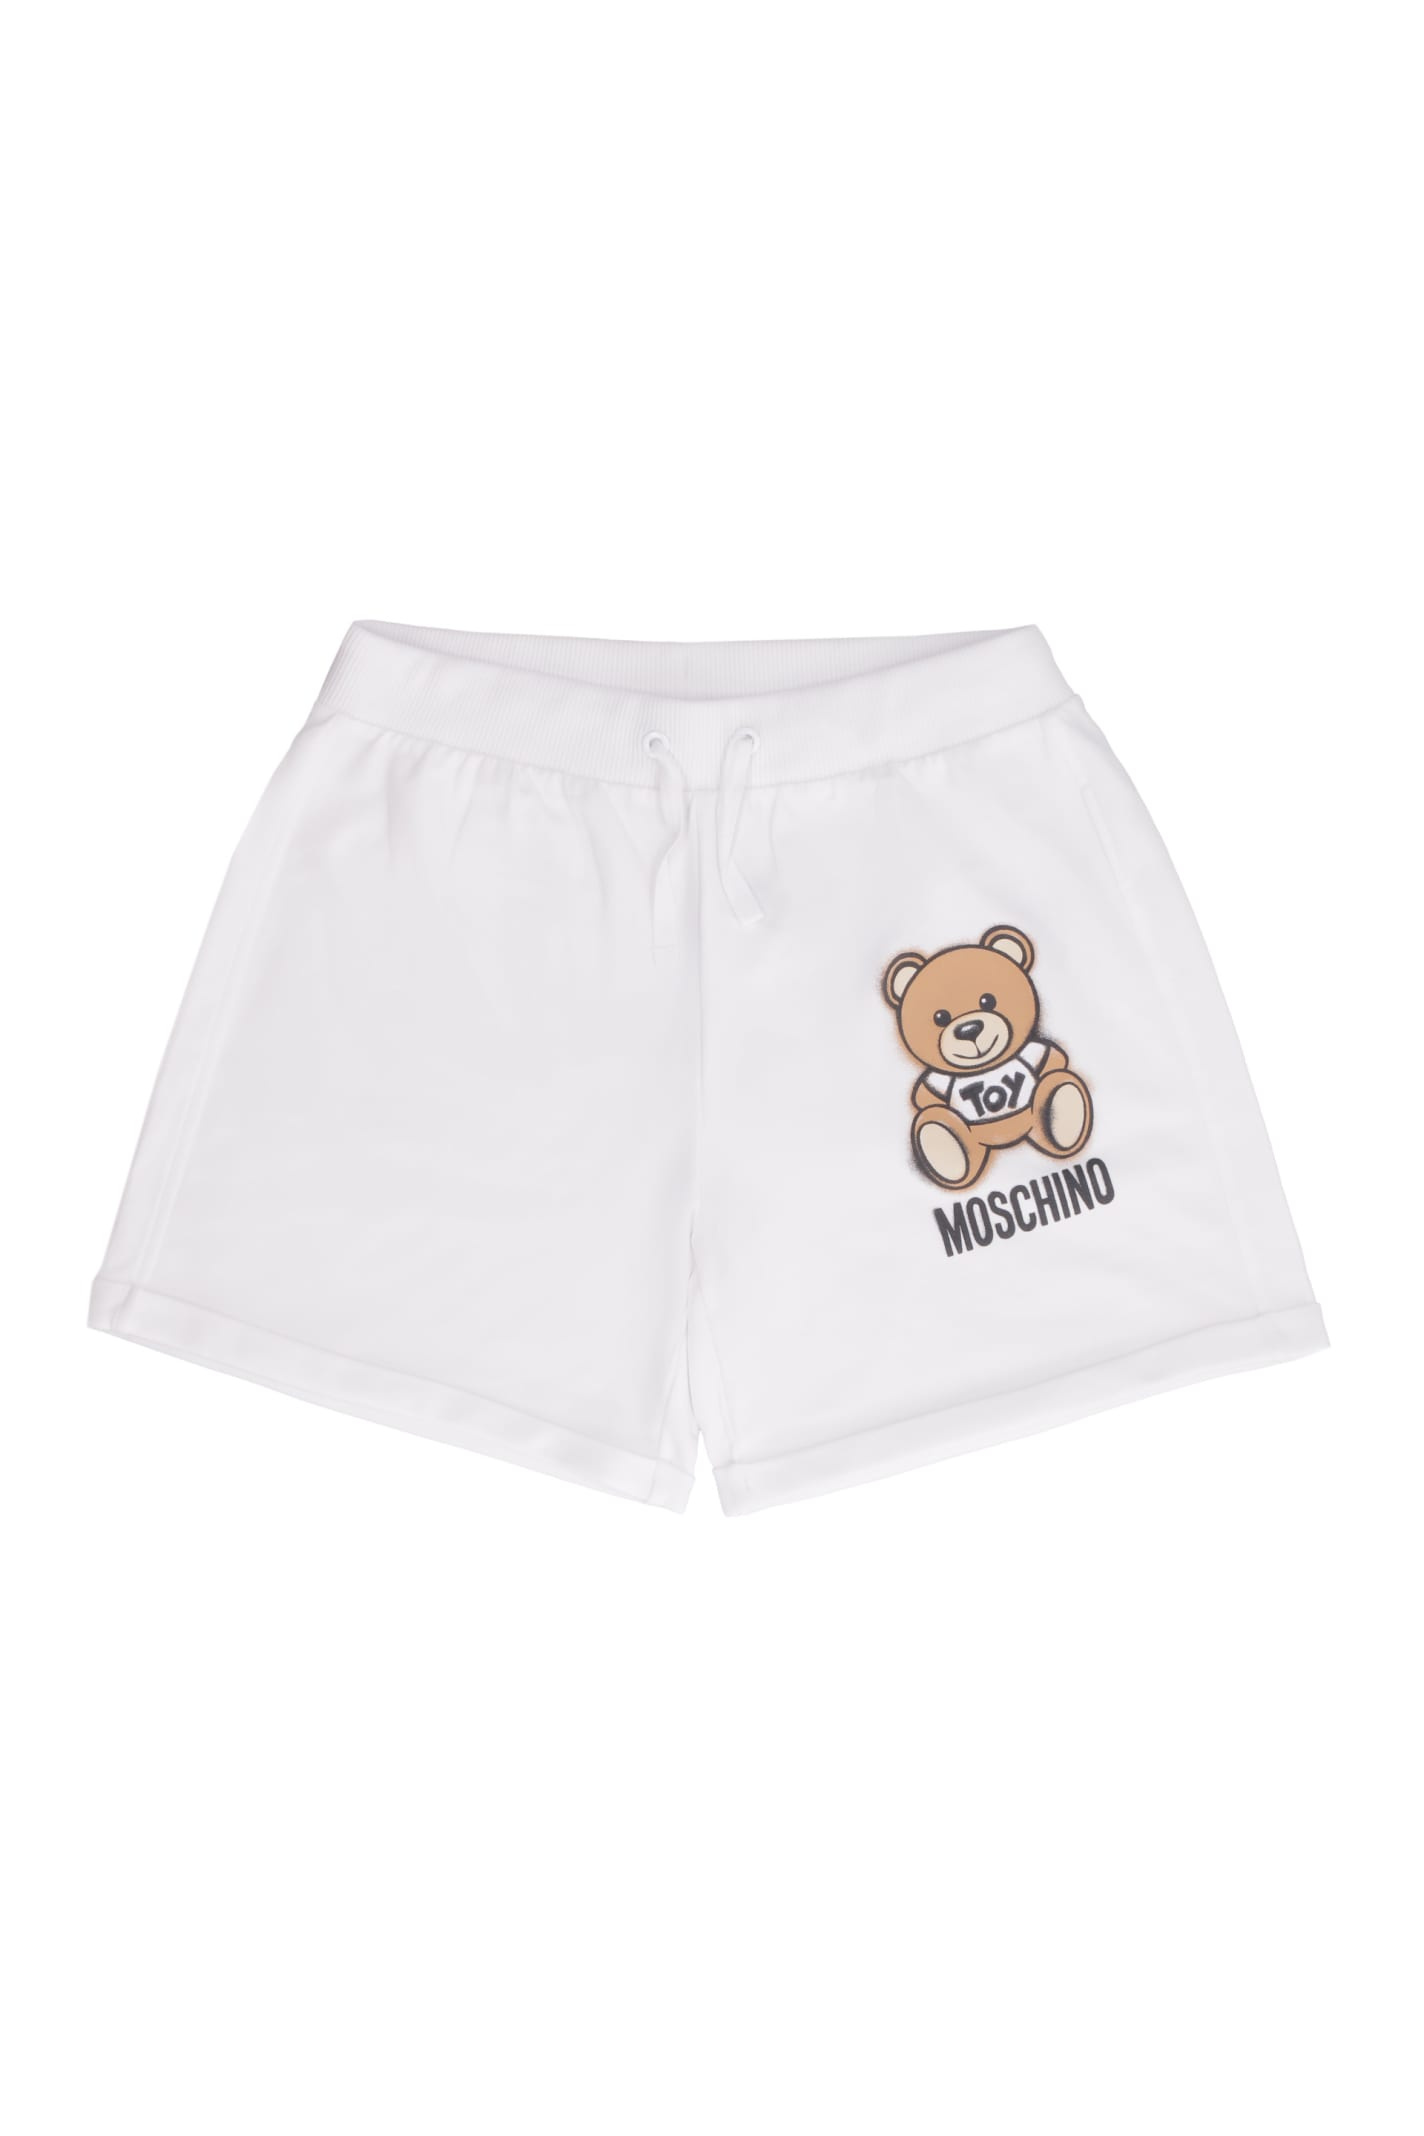 Moschino Shorts PRINTED SWEATSHORTS